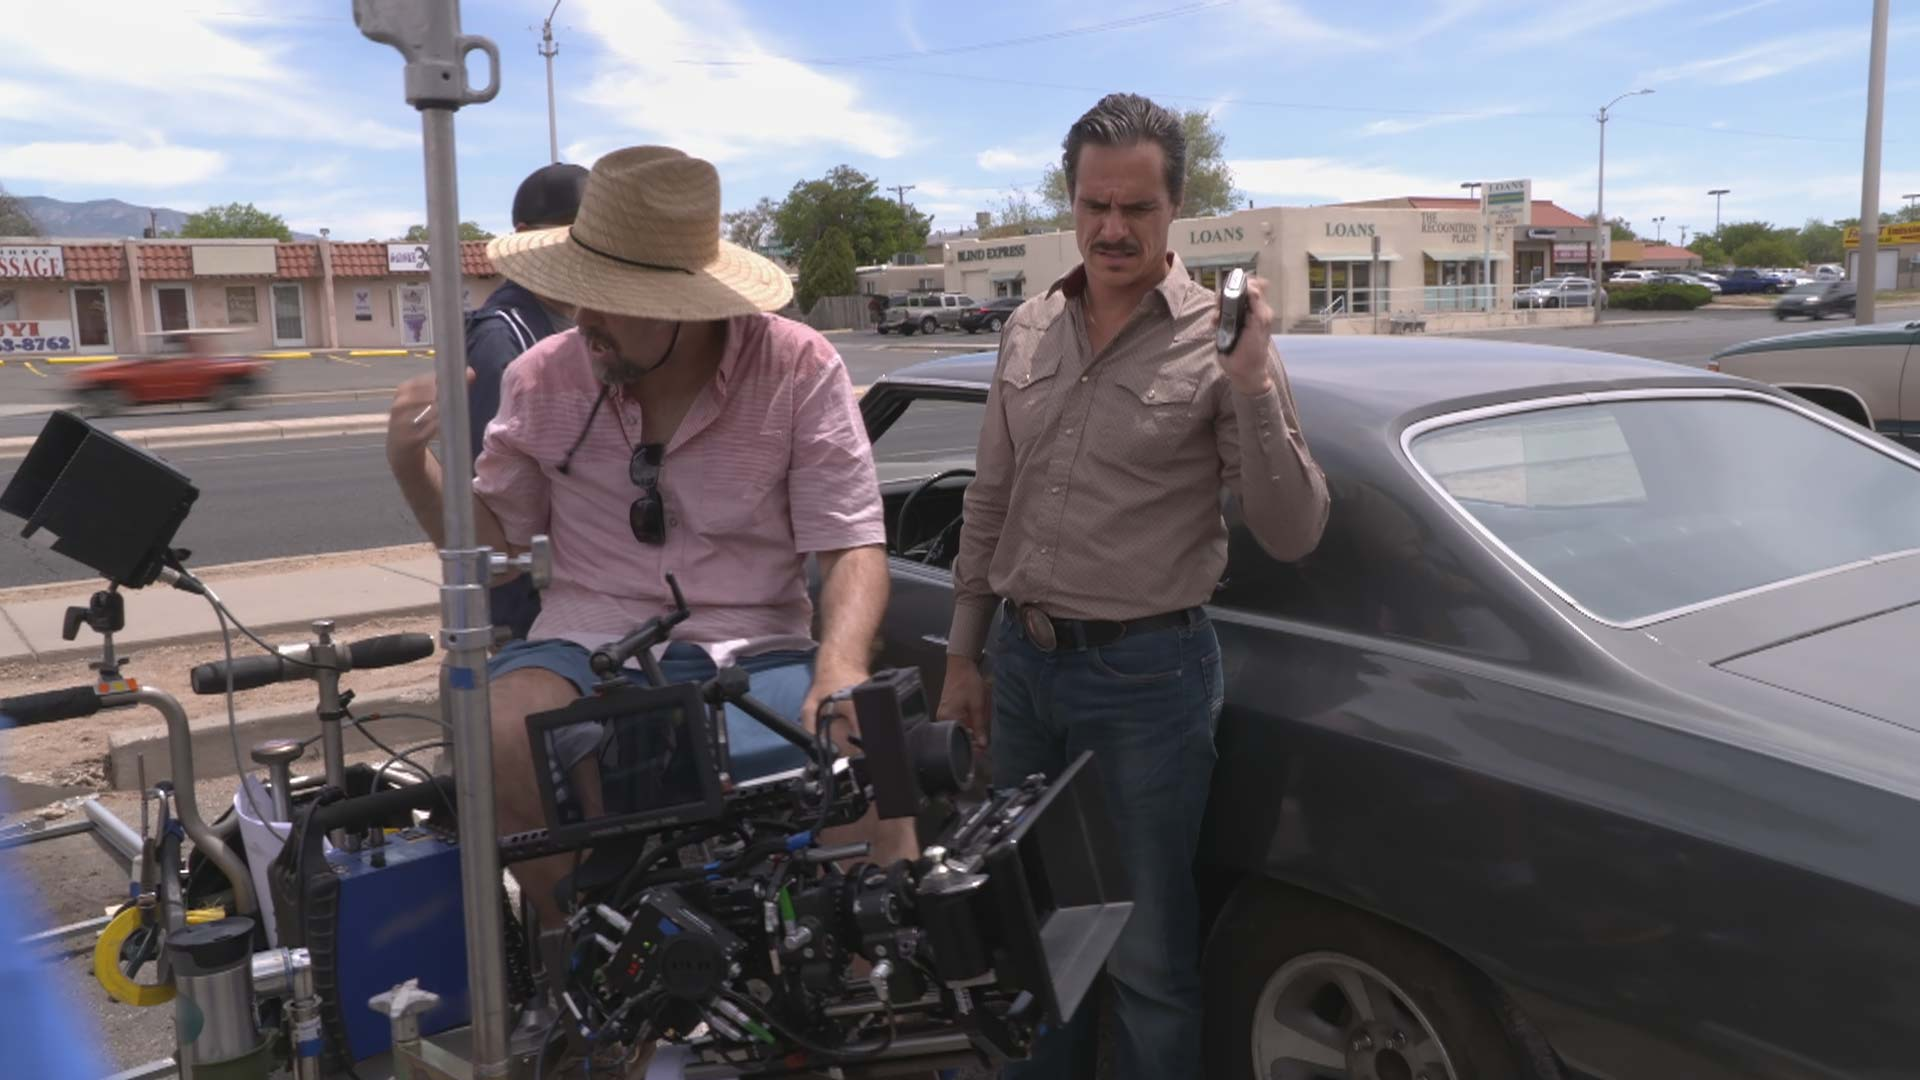 Making of Better Call Saul: Season 4, Episode 10